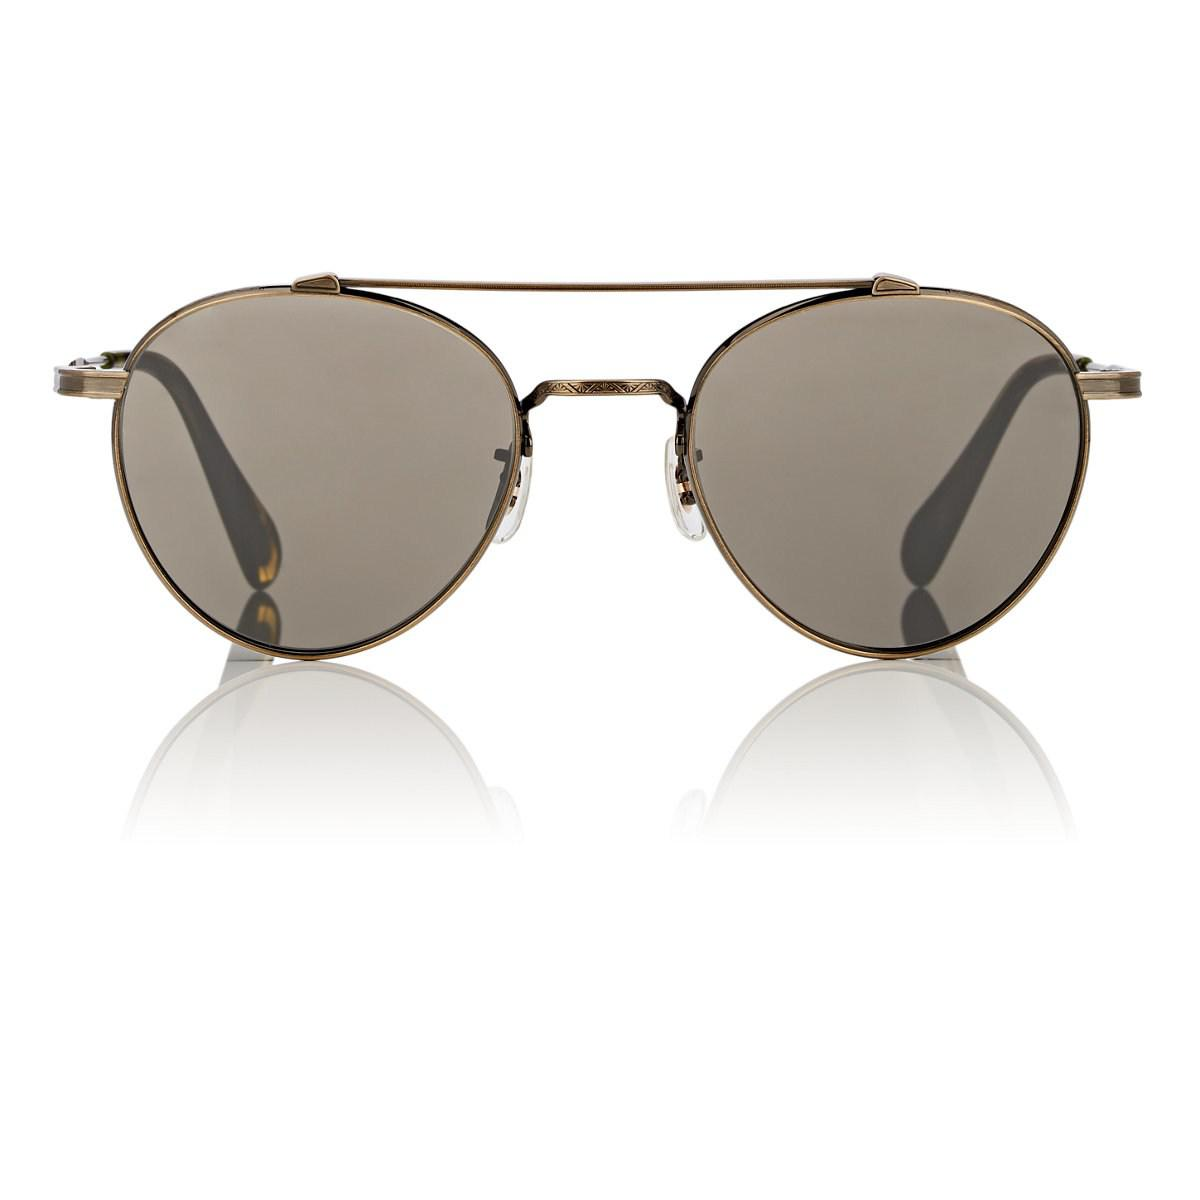 cecc8ba31d70d Oliver Peoples Watts Sun Sunglasses in Metallic for Men - Lyst